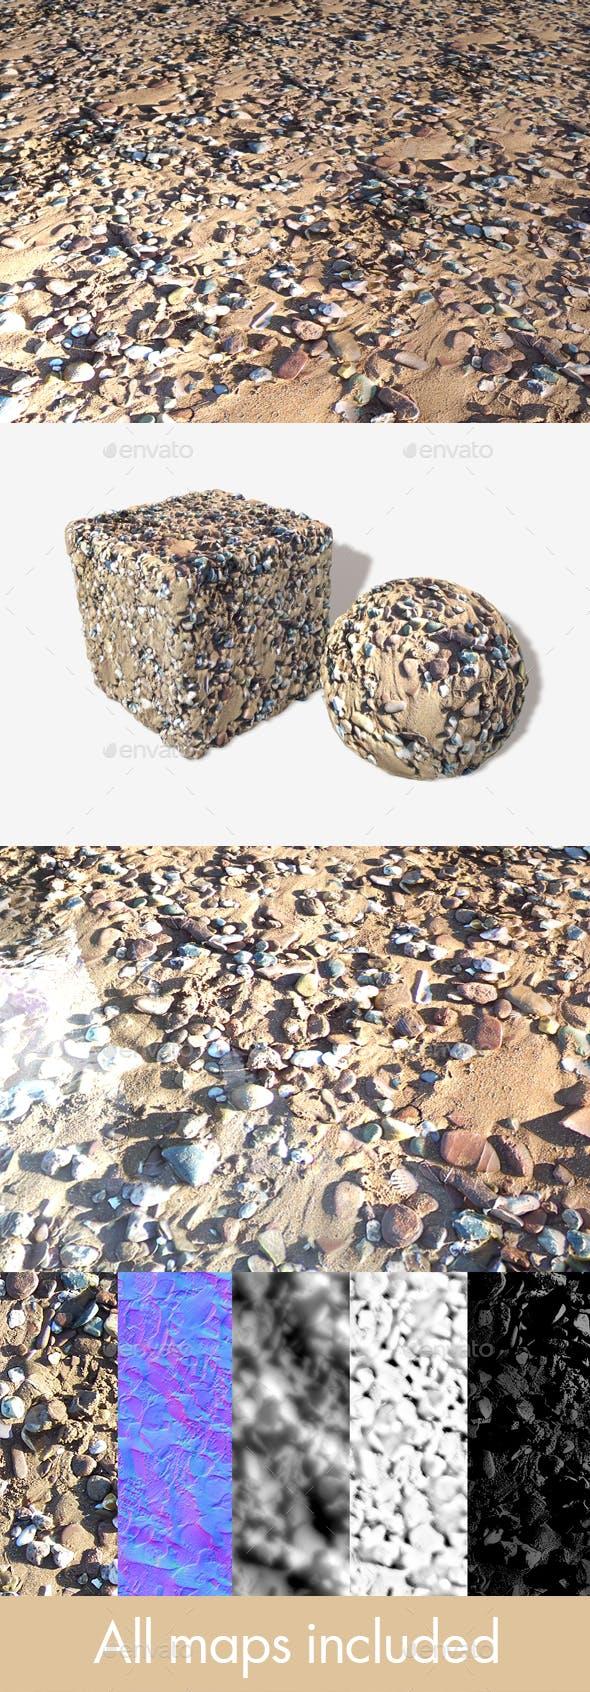 Stony Beach 02 Seamless Texture - 3DOcean Item for Sale